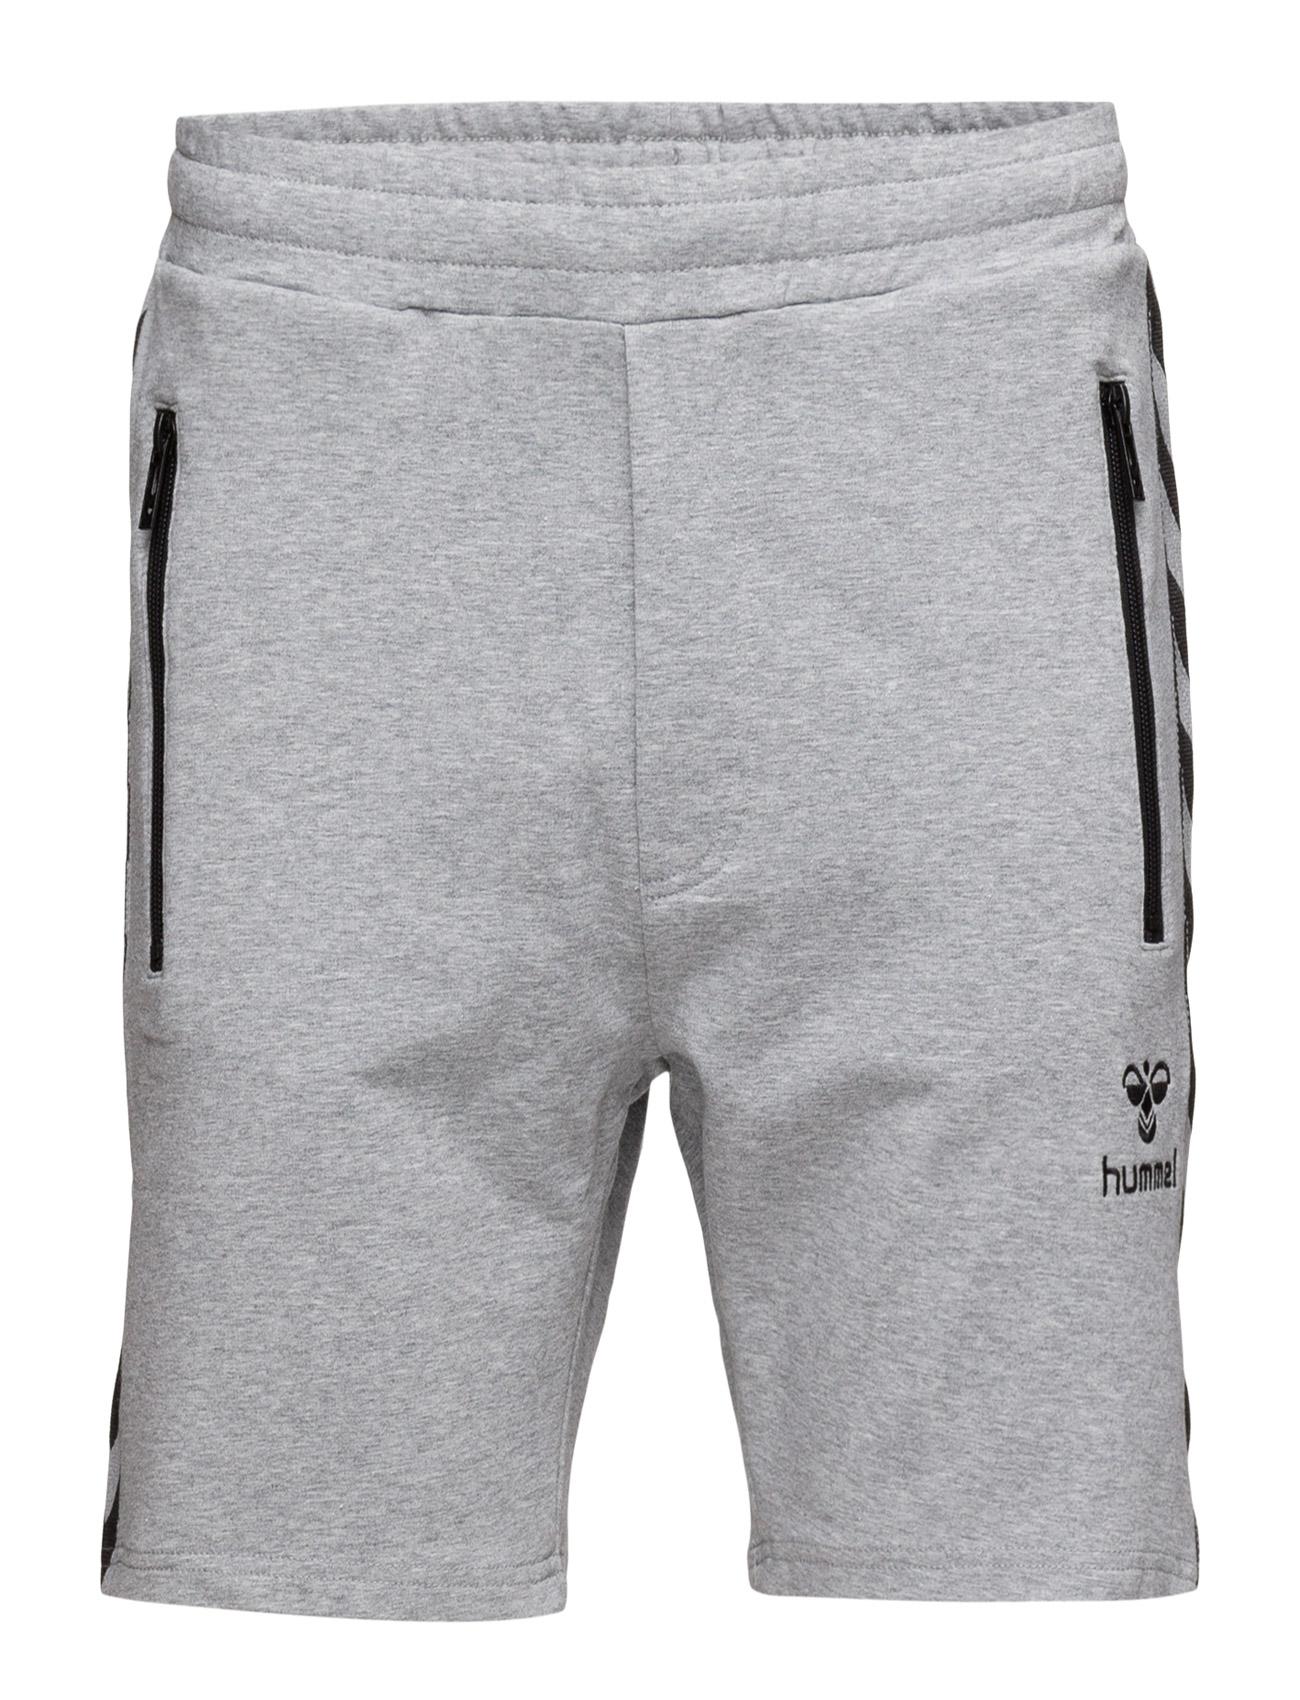 Hummel CLASSIC BEE AAGE SHORTS Shorts